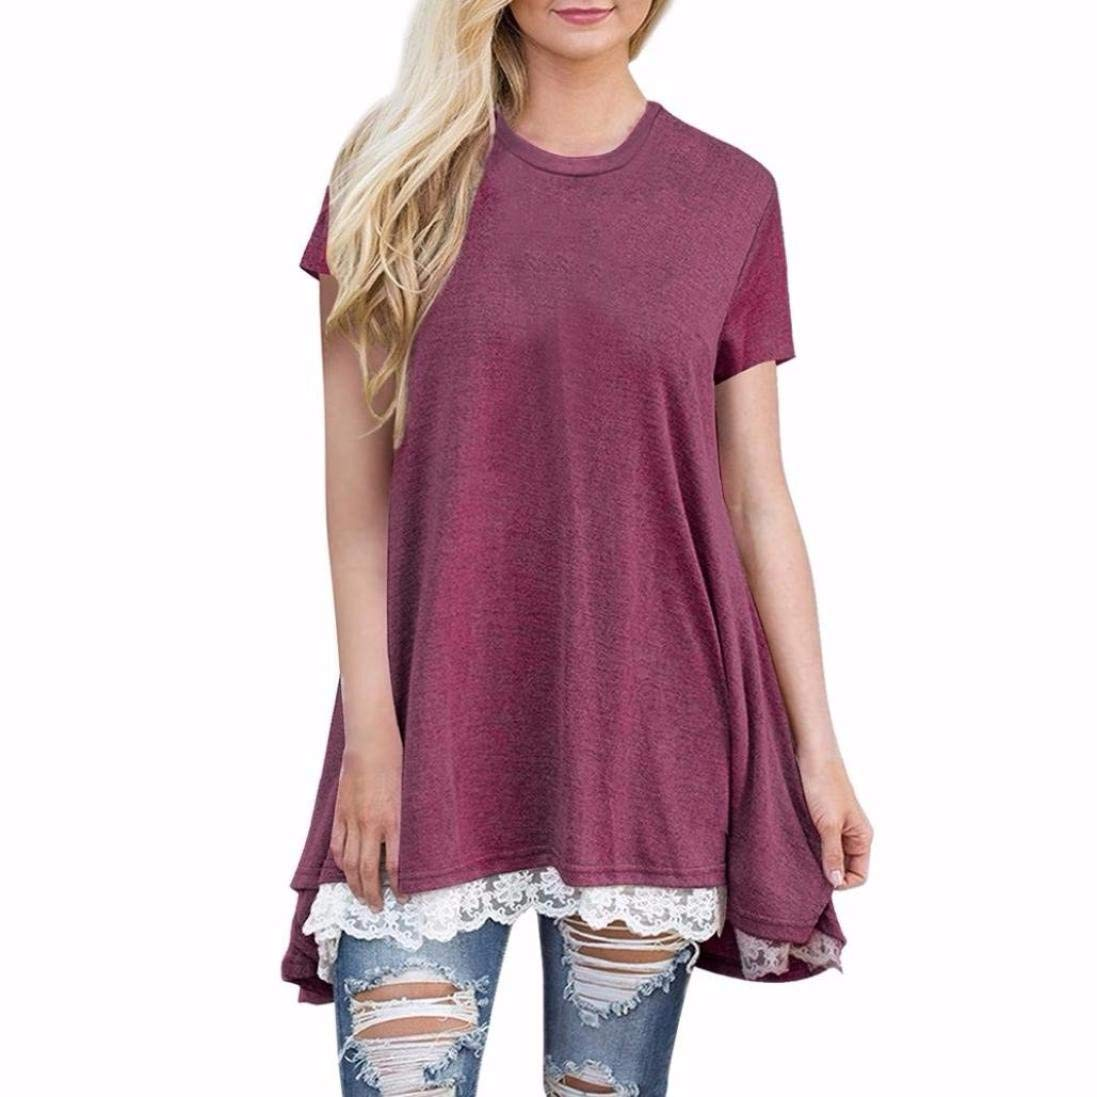 Clearance ! Women Blouse, ღ Ninasill ღ Fashion Lace Short Sleeve O- Neck Tops T Shirt Tank (M, Wine Red)